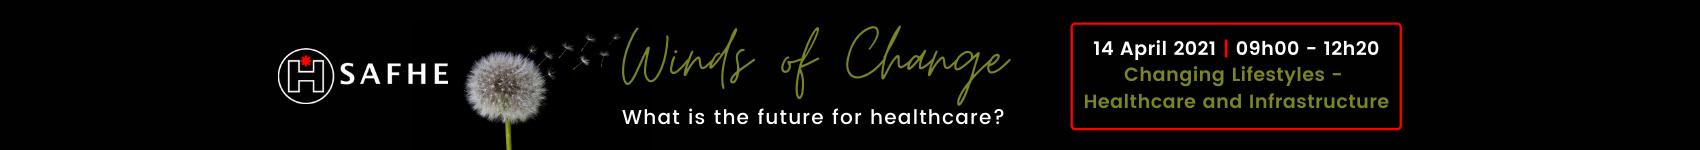 SAFHE Event Page Banner - 14 April 2021